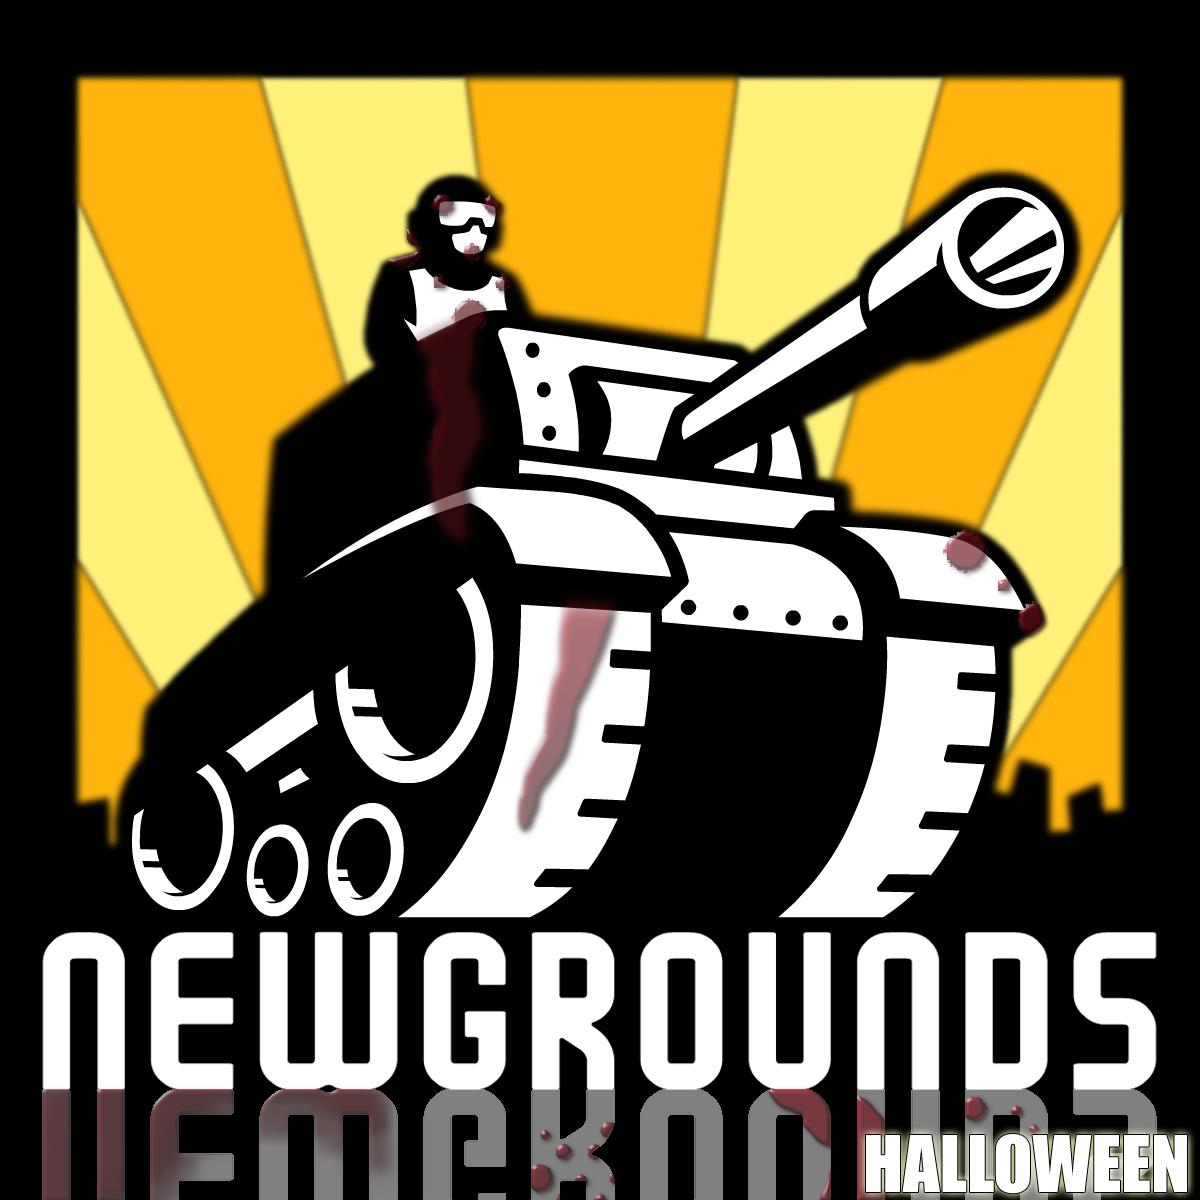 Tankman for Halloween 2010